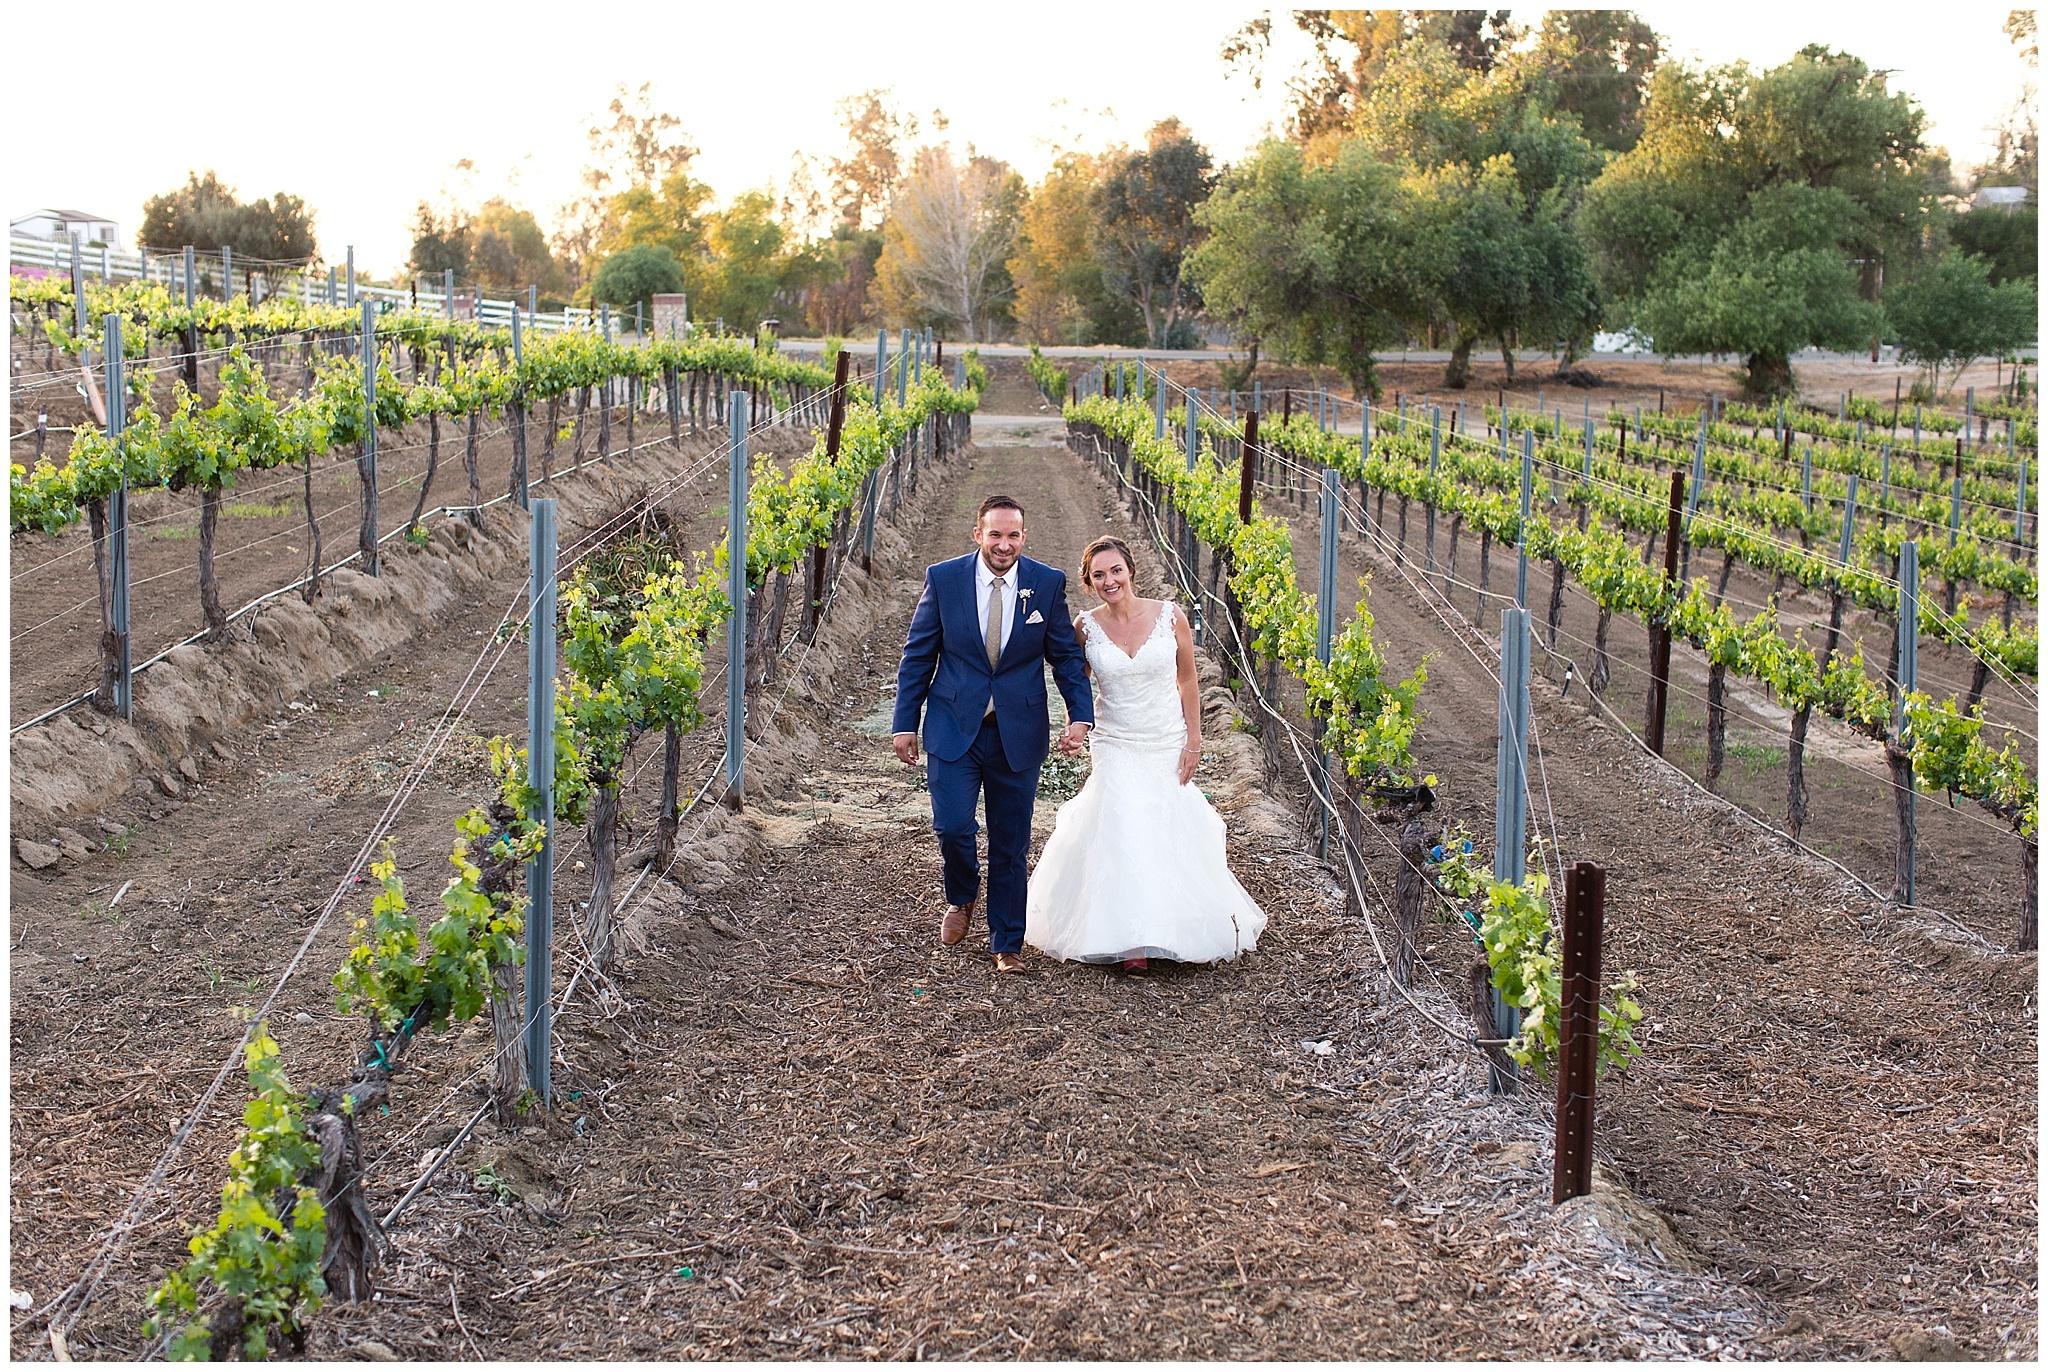 Vinny-Cayt-Wedding-04-26-18-1720.jpg